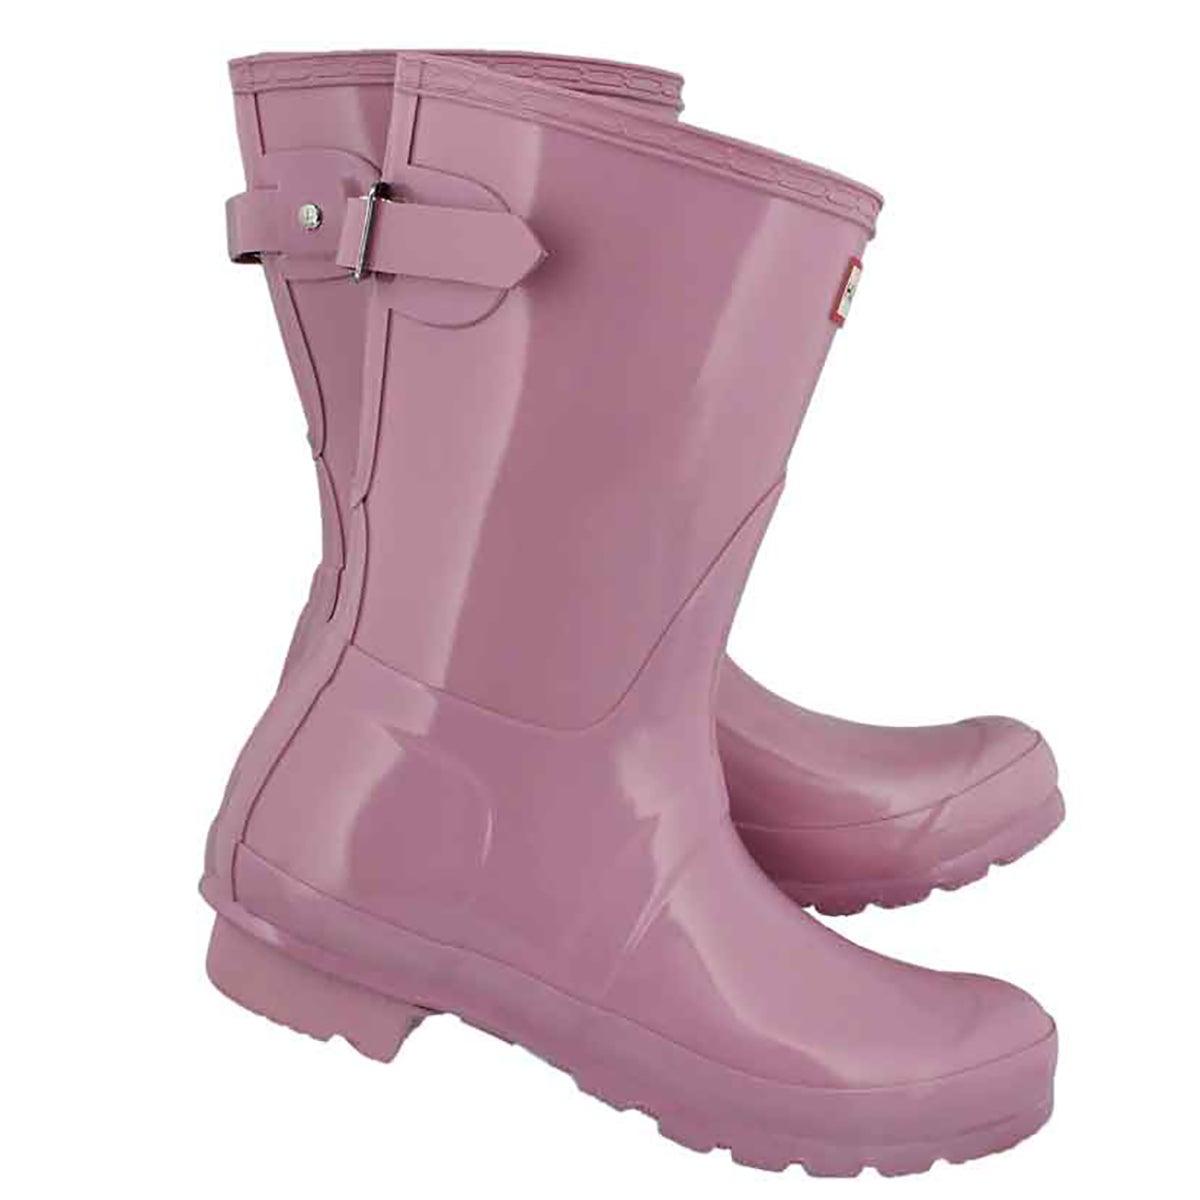 Lds Org Back Adj Shrt Gloss blo rainboot